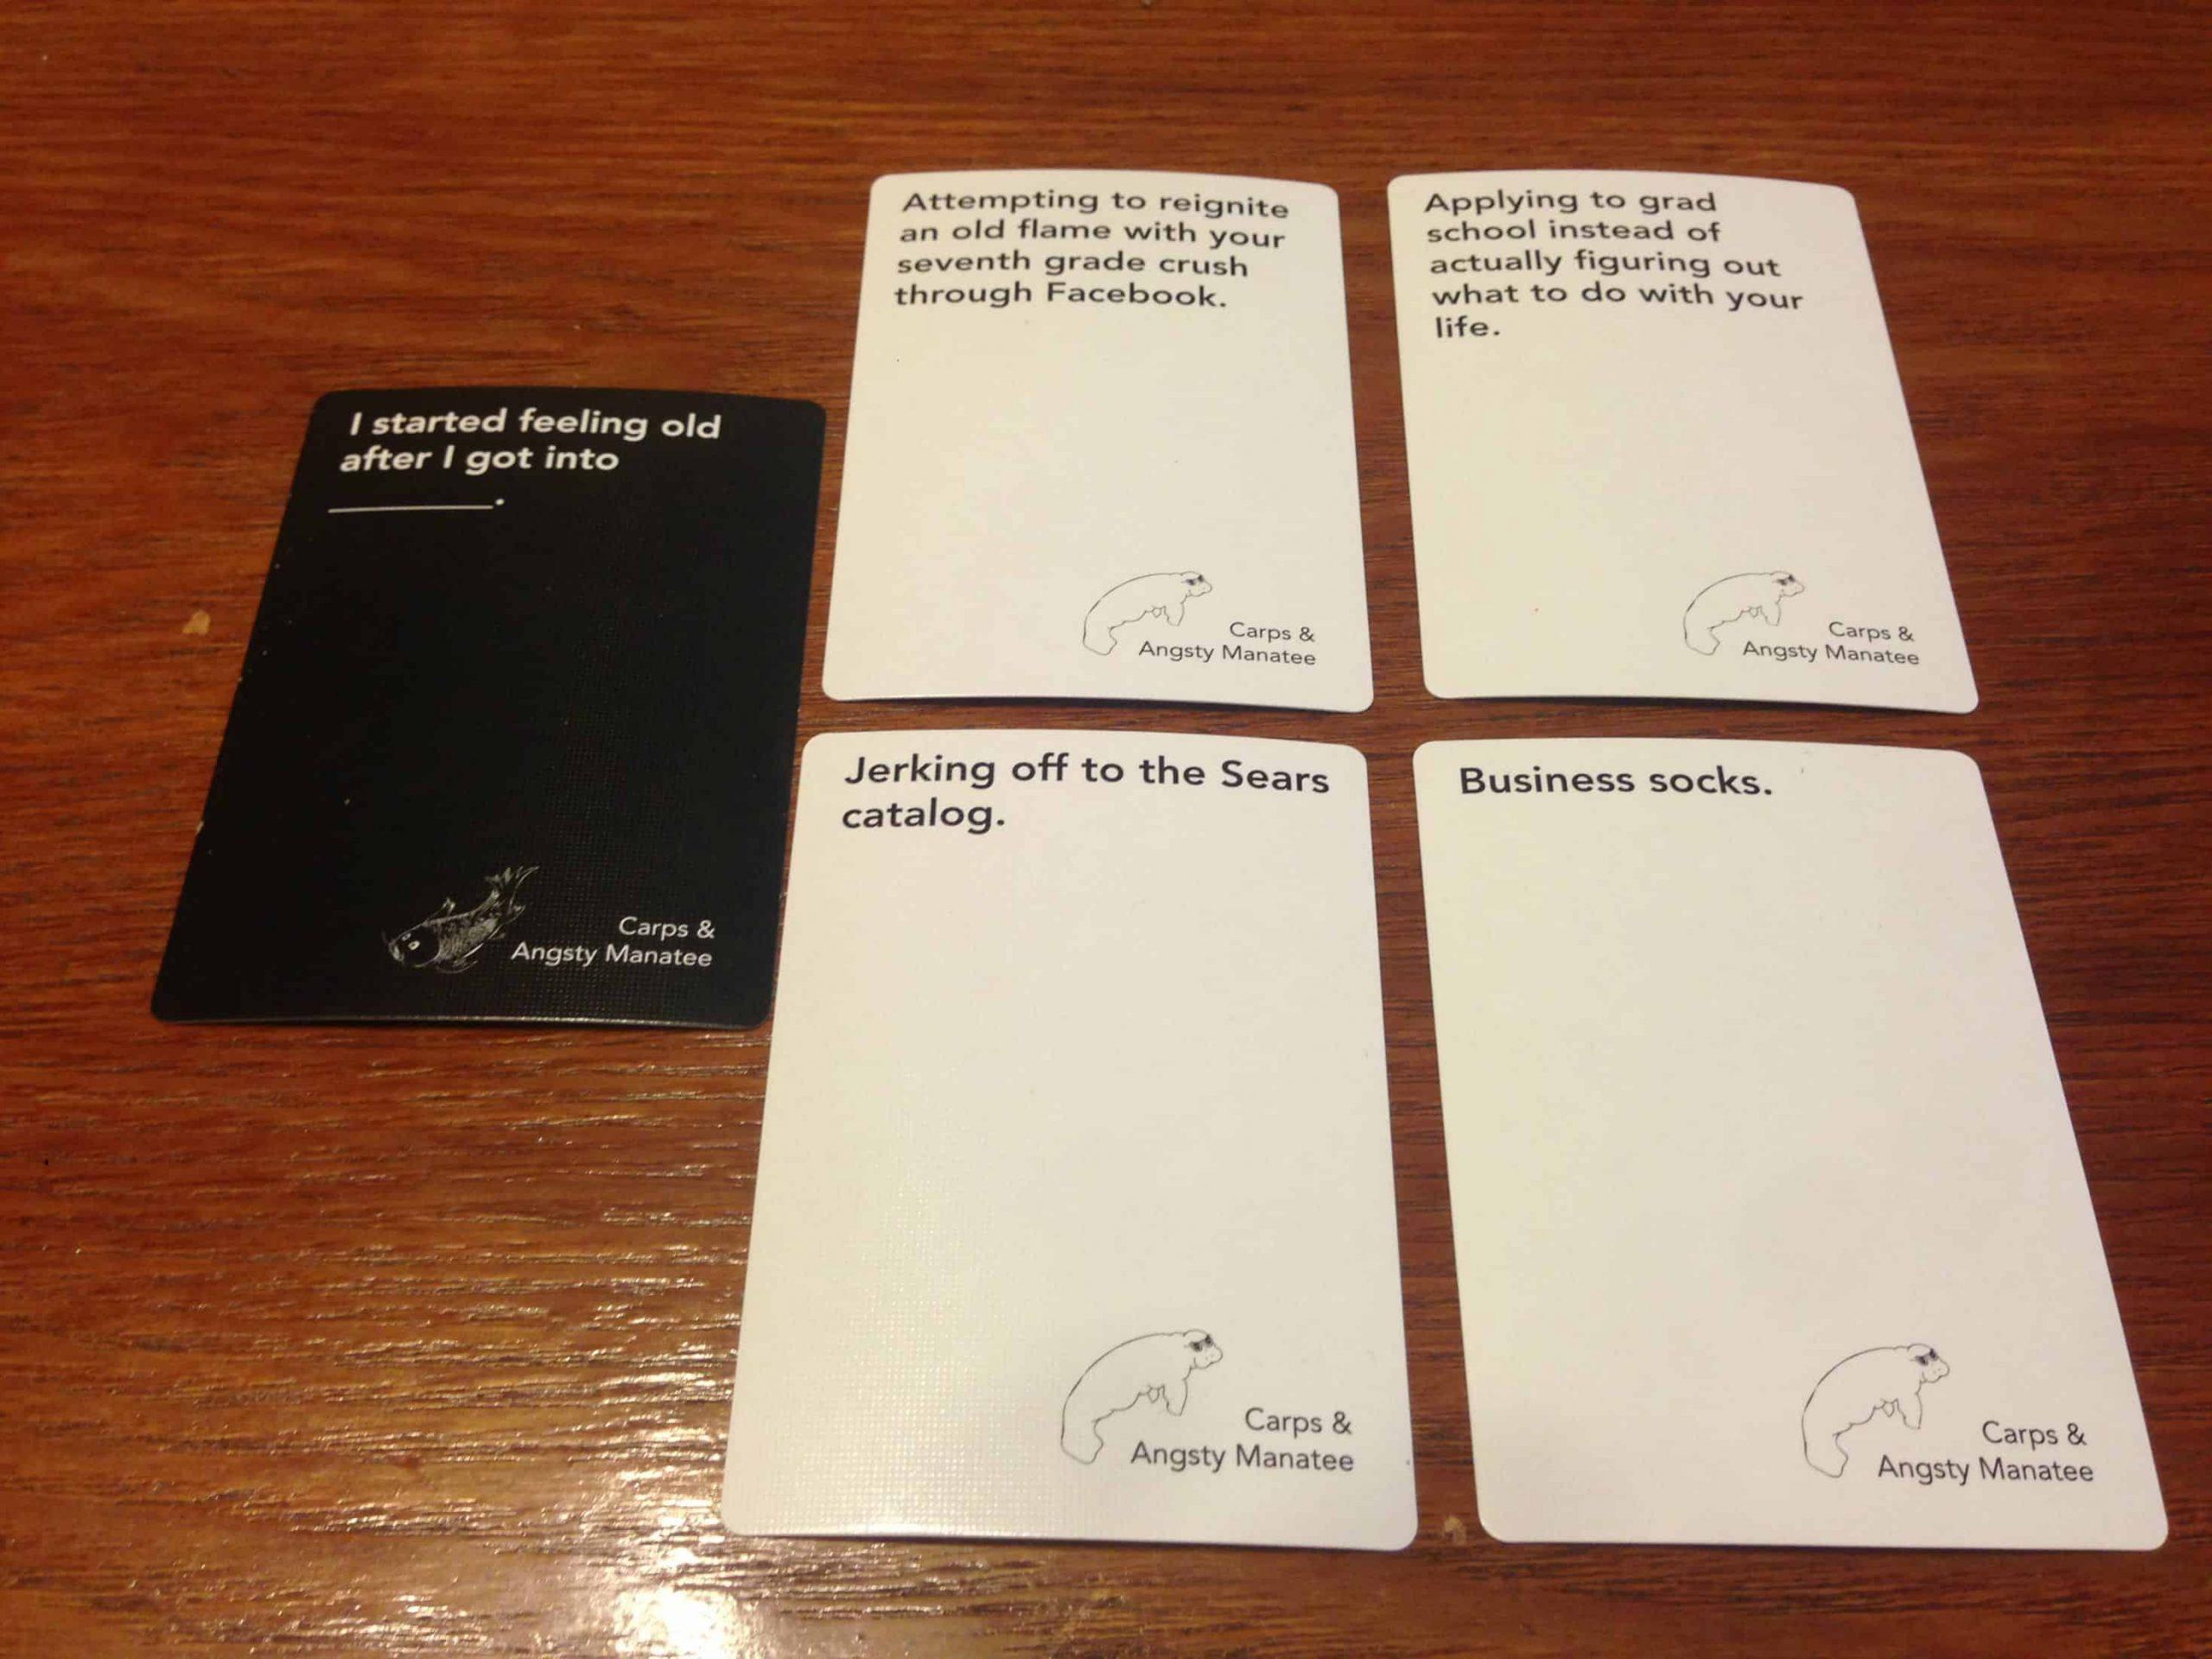 Carbs & Angsty Manastee Cards 4